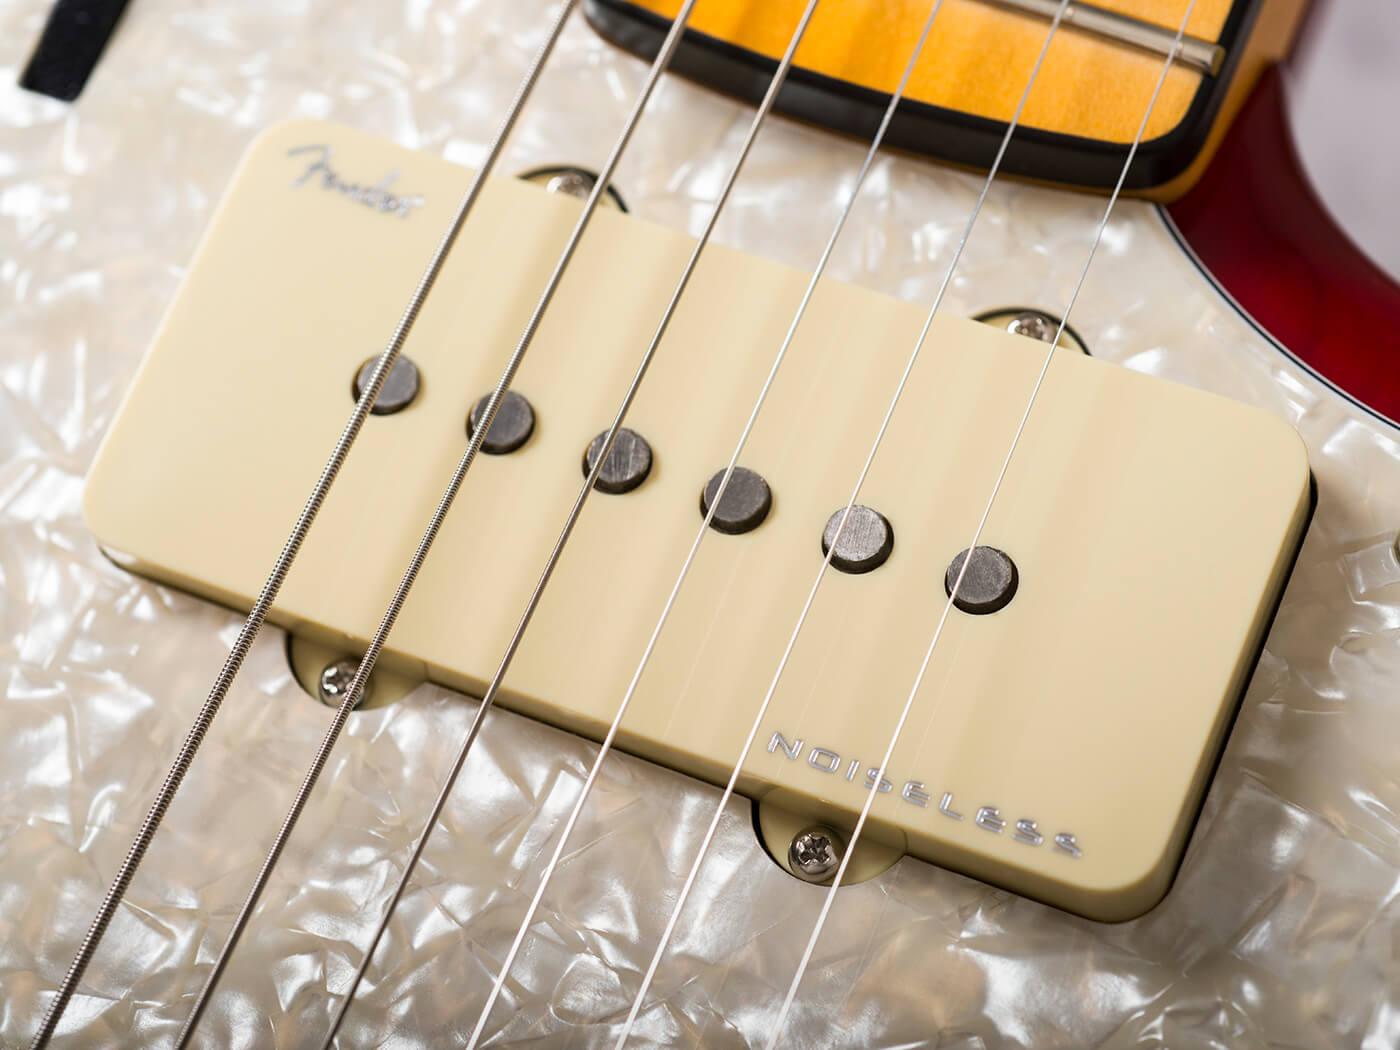 Fender Ultra Jazzmaster (Pickups)